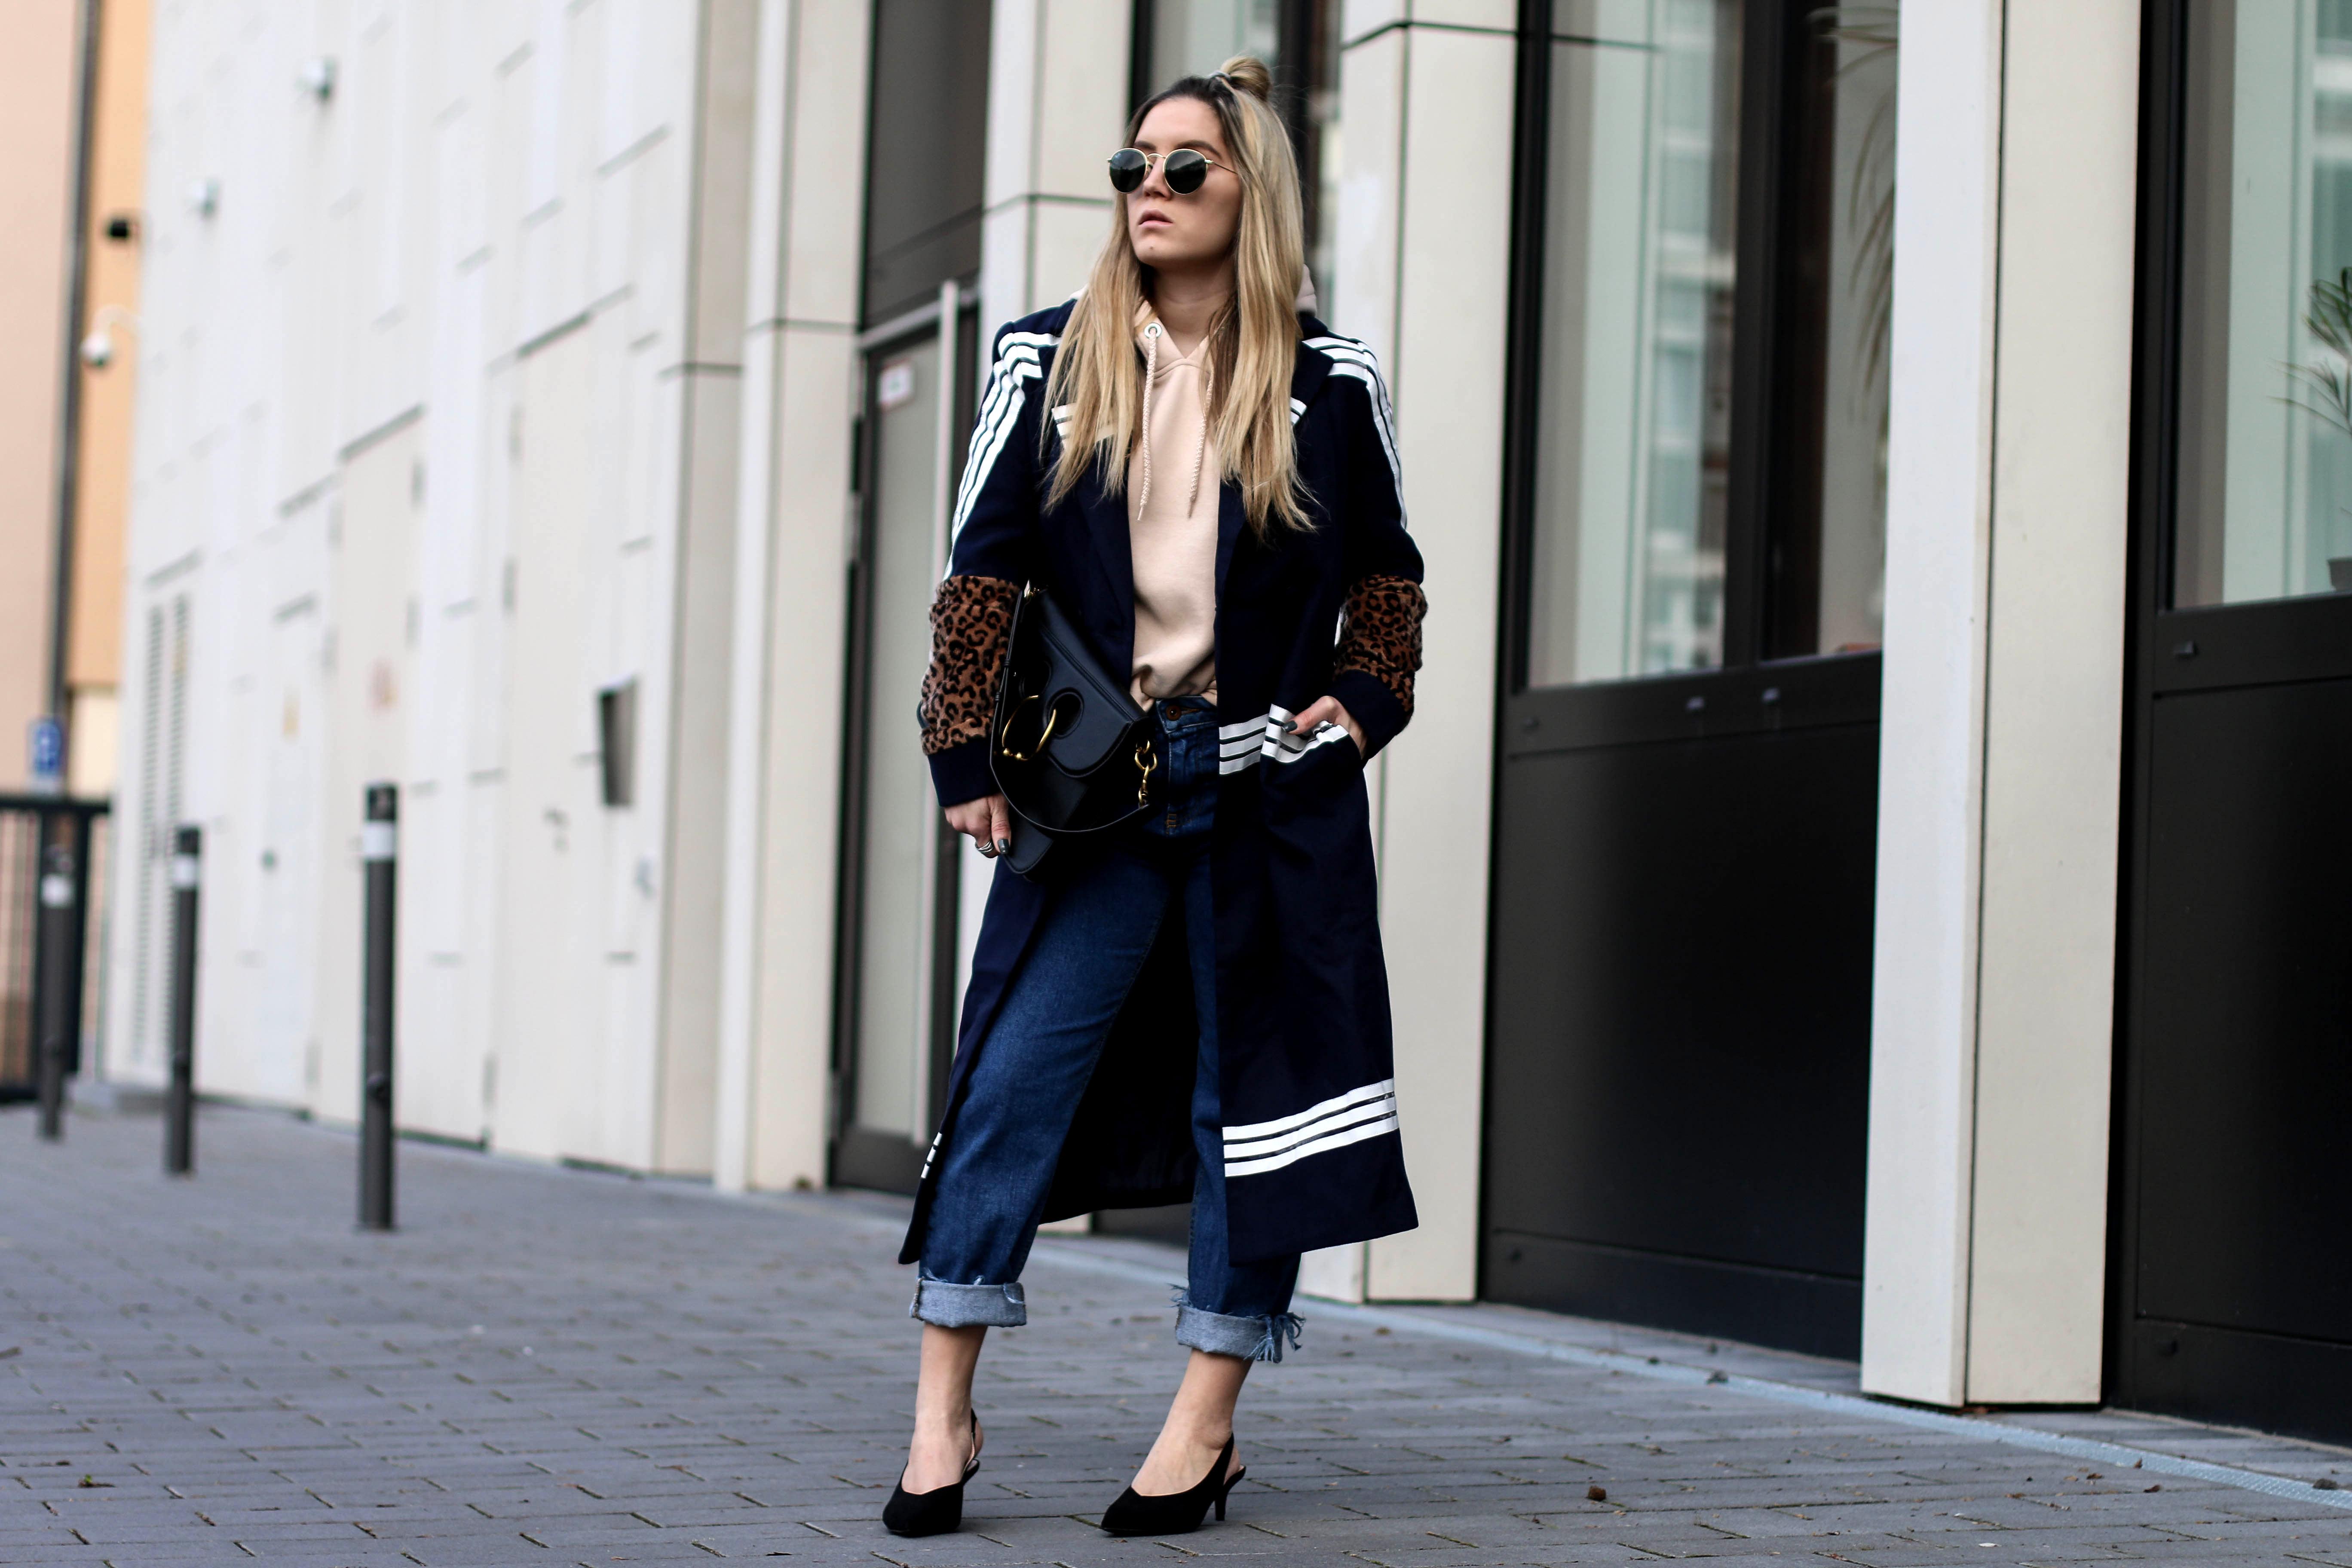 Sheinside Maxi Coat Streetstyle Pink Hoodie JW Anderson Bag